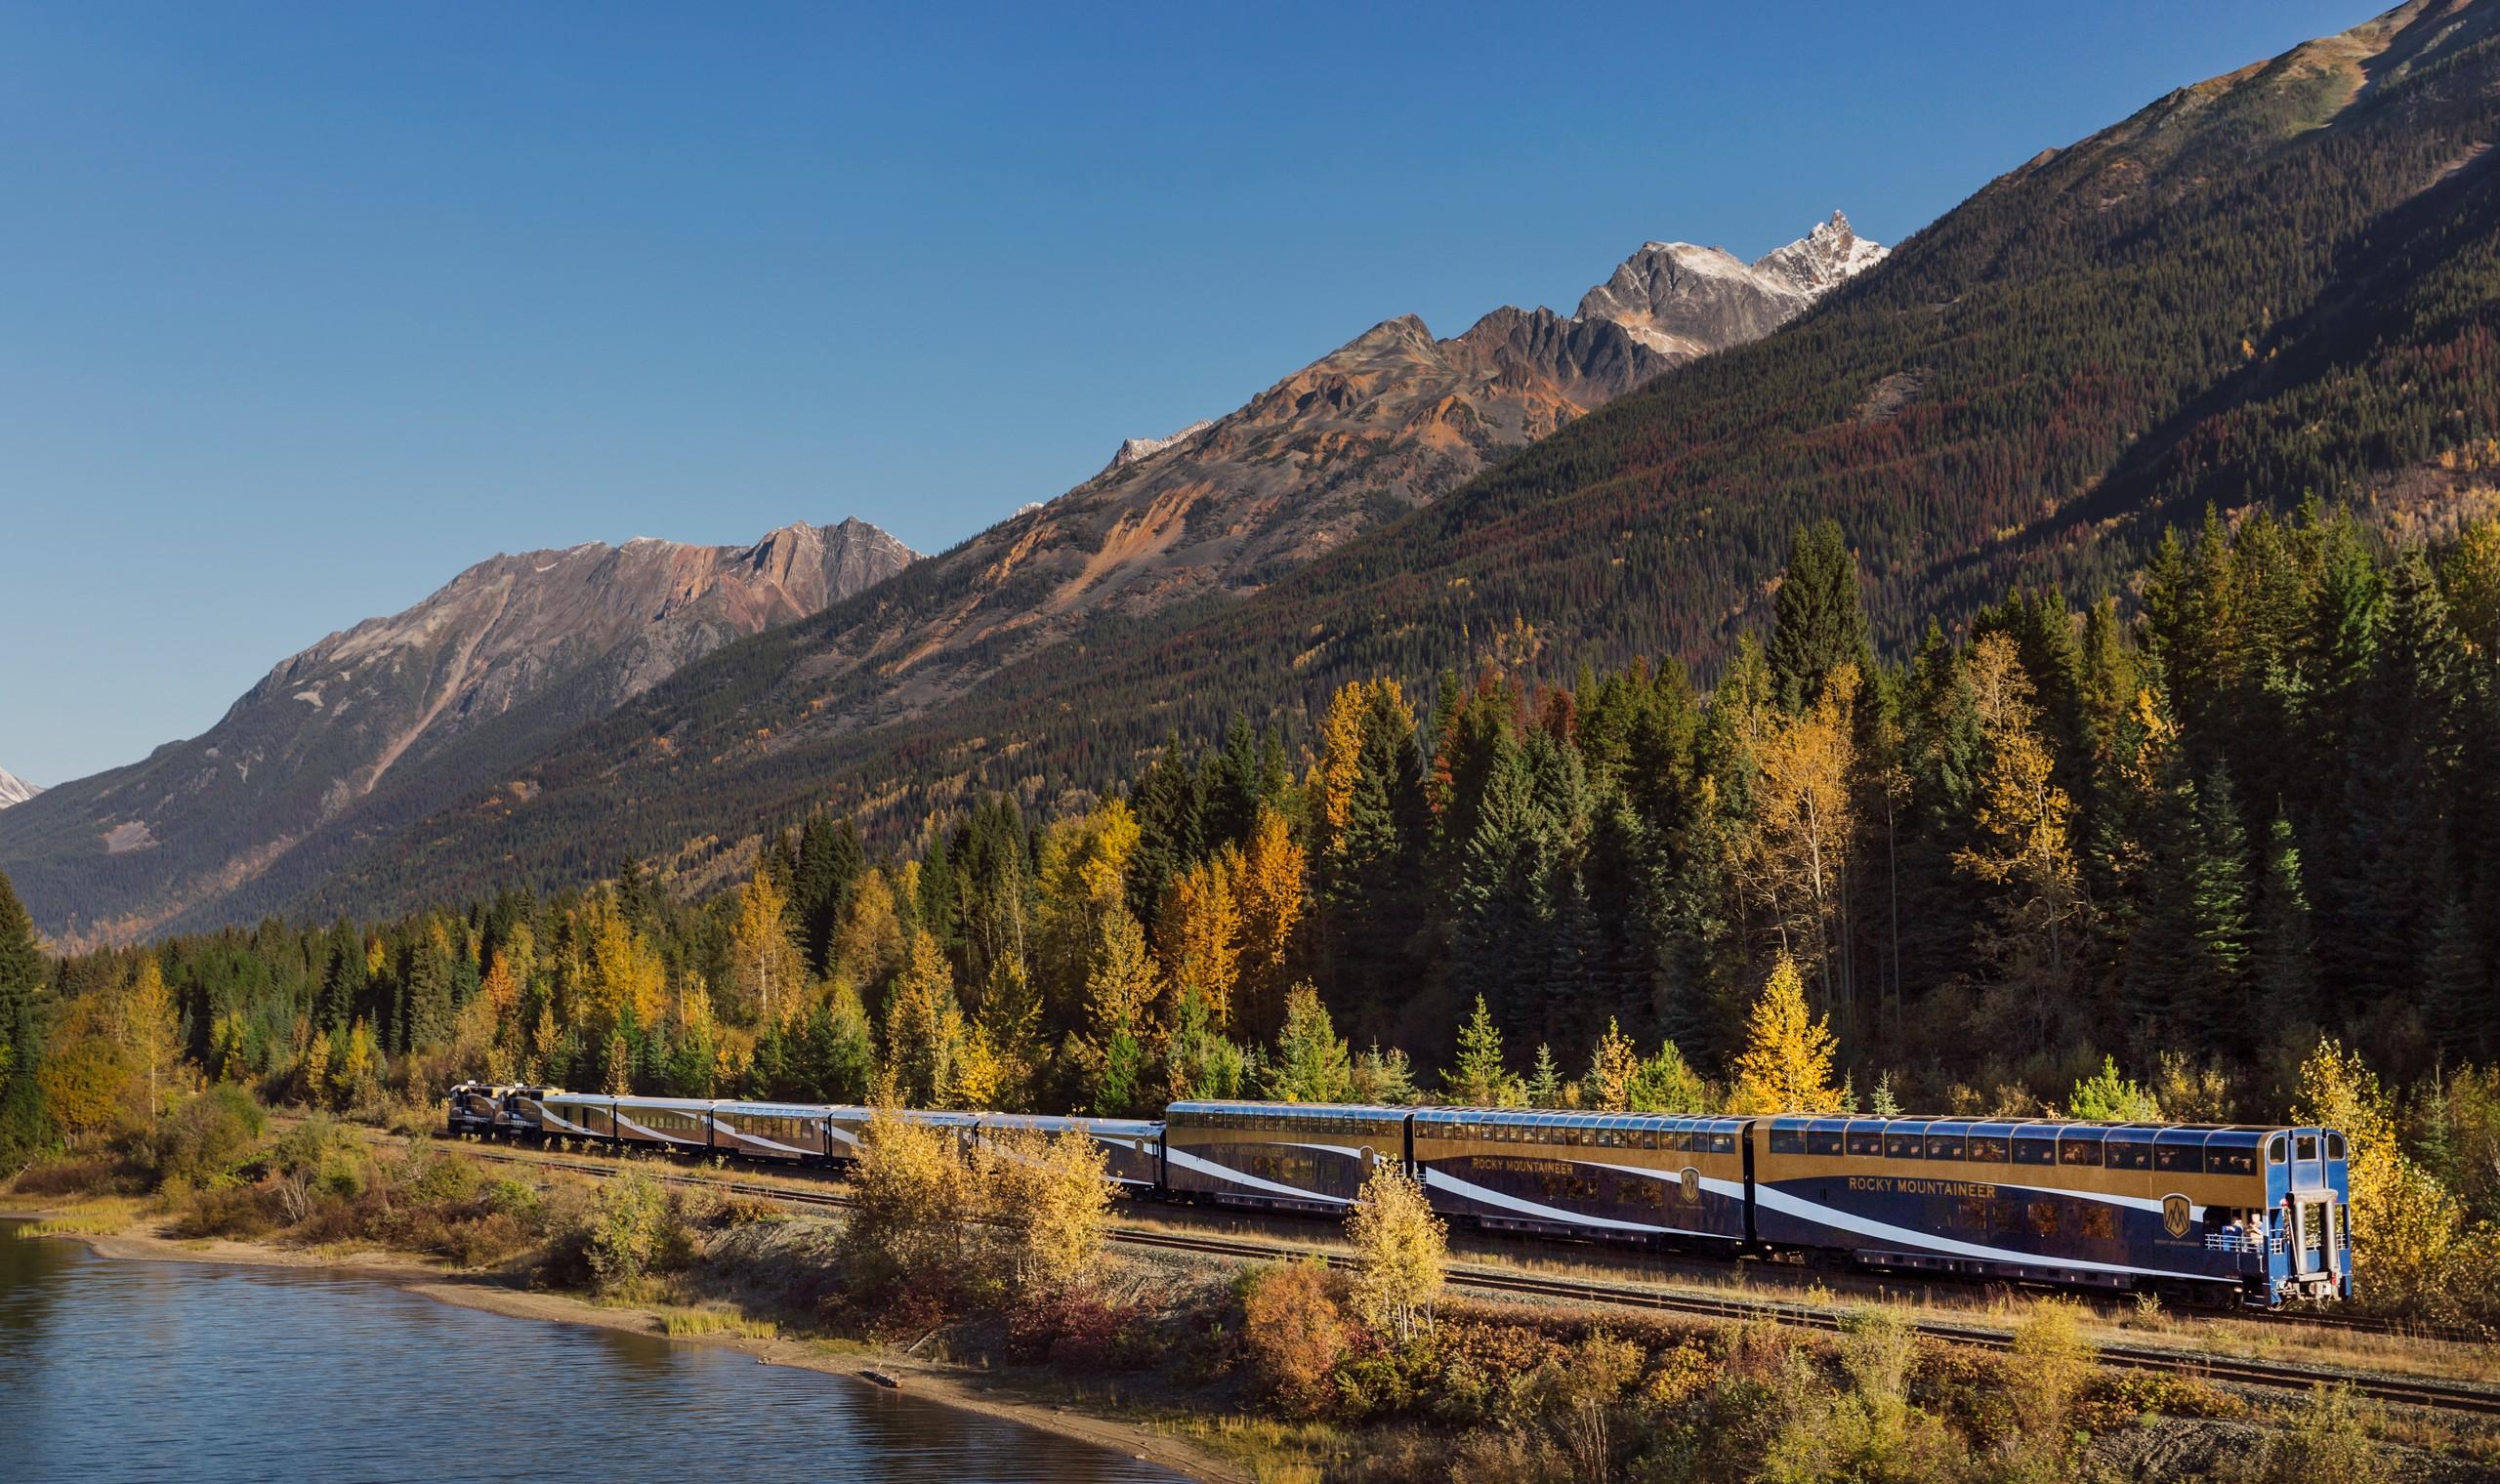 Rockies By Rail Details